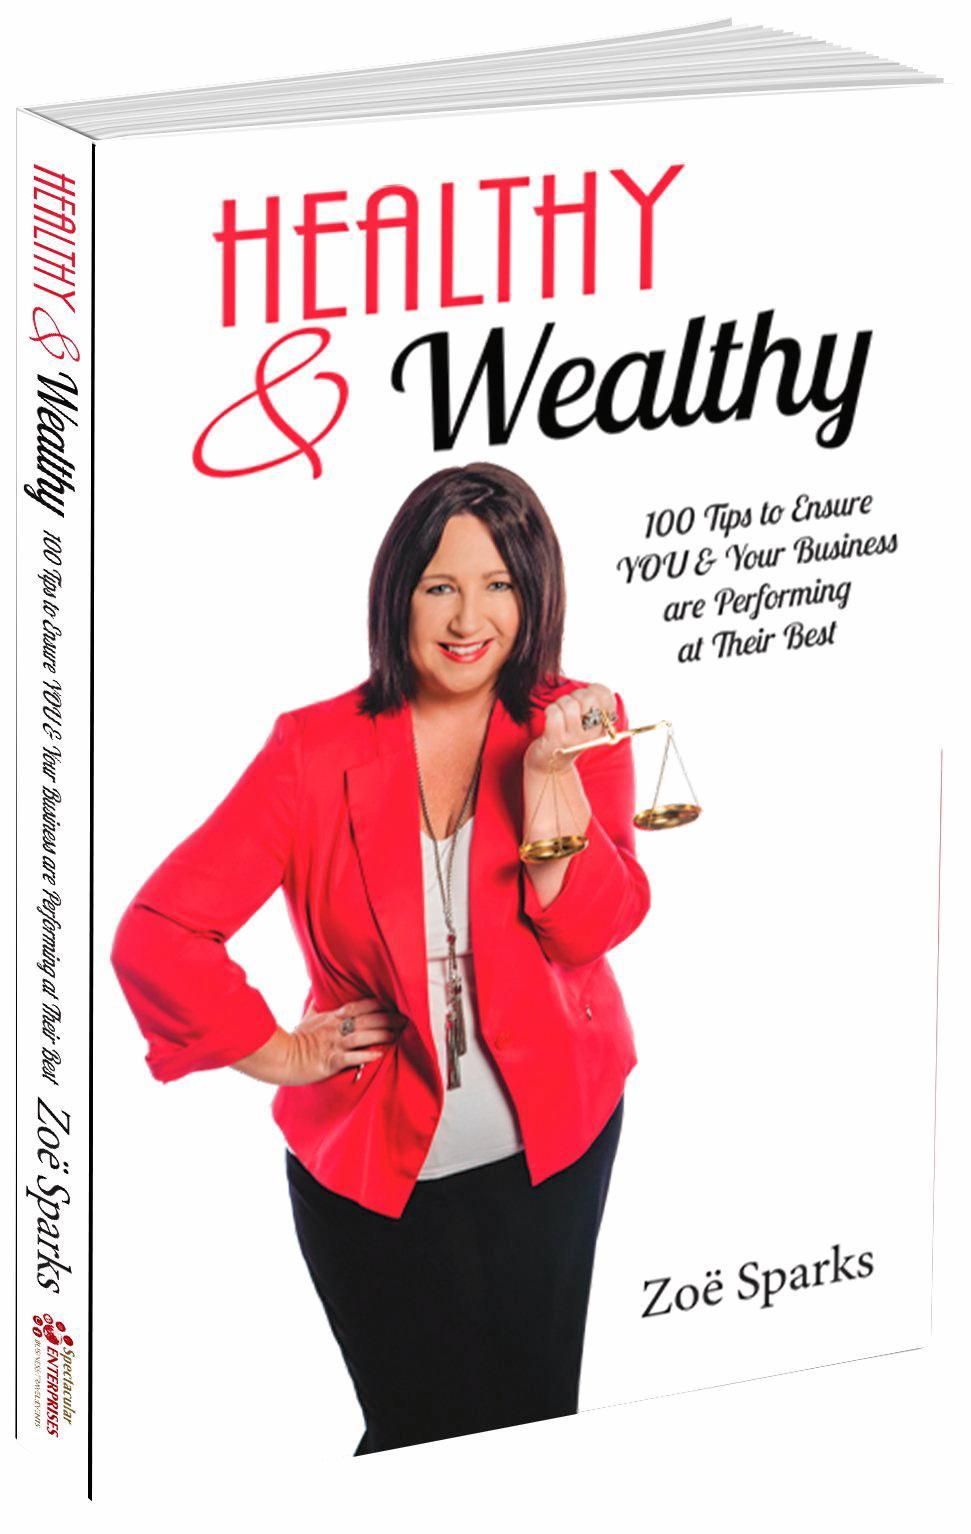 Zoe Sparks Healthy & Wealthy